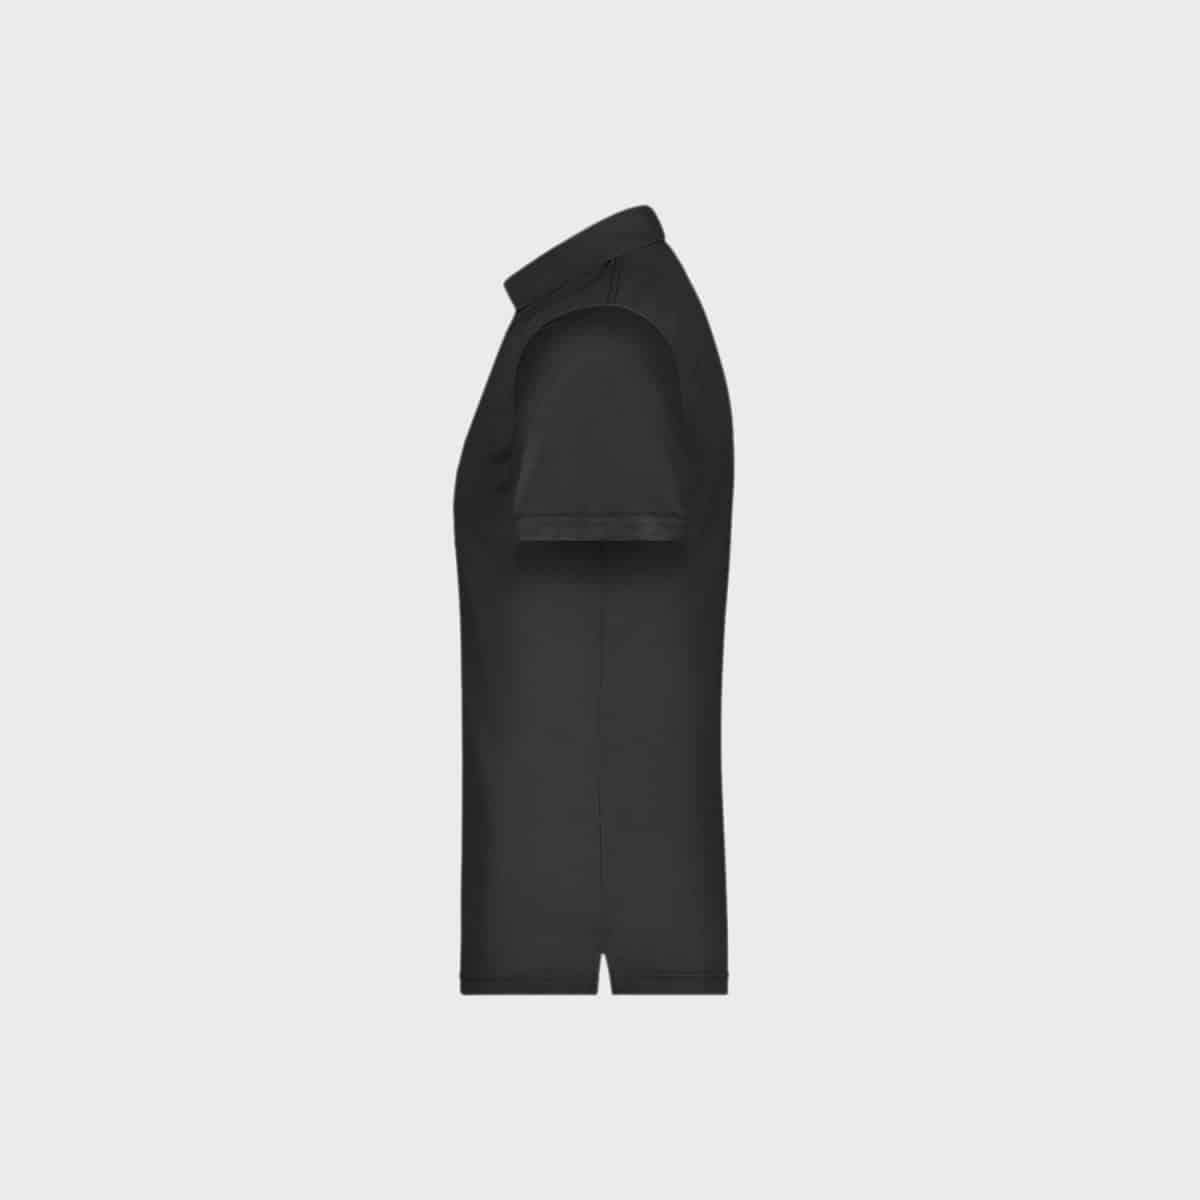 Daiber SportShirts JN401 Black Side